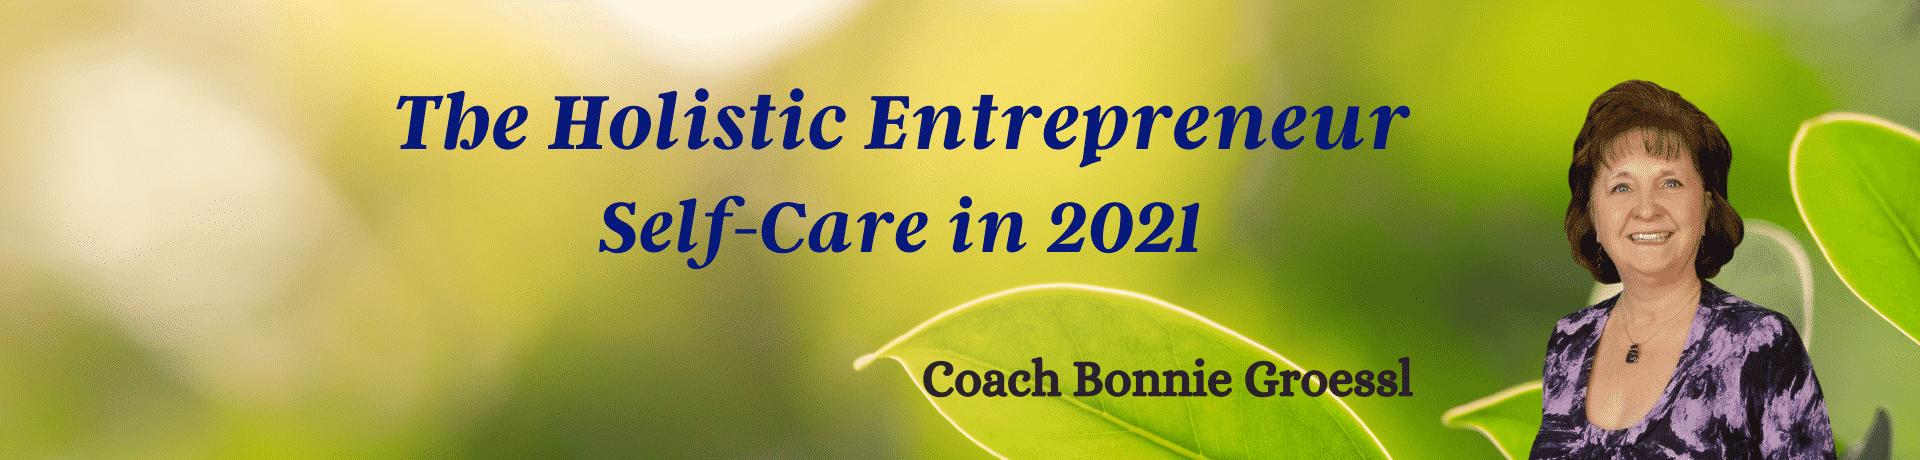 The Holistic Entrepreneur Self Care for 2021 Coach Bonnie Groessl